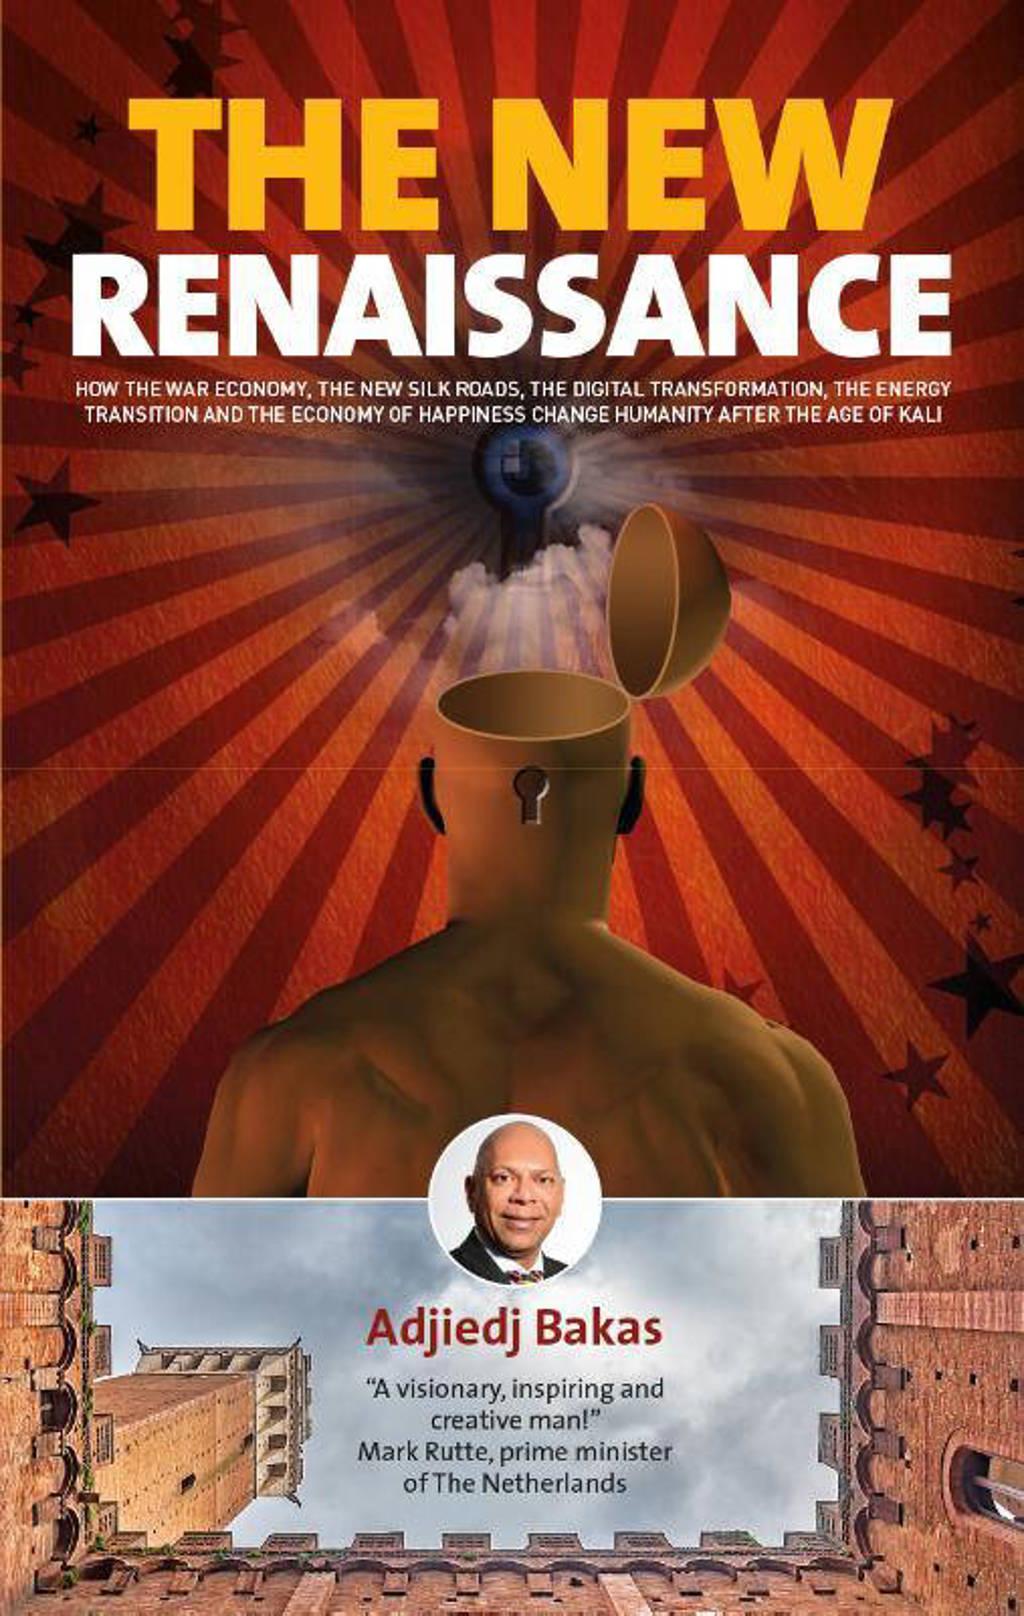 The New Renaissance - Adjiedj Bakas